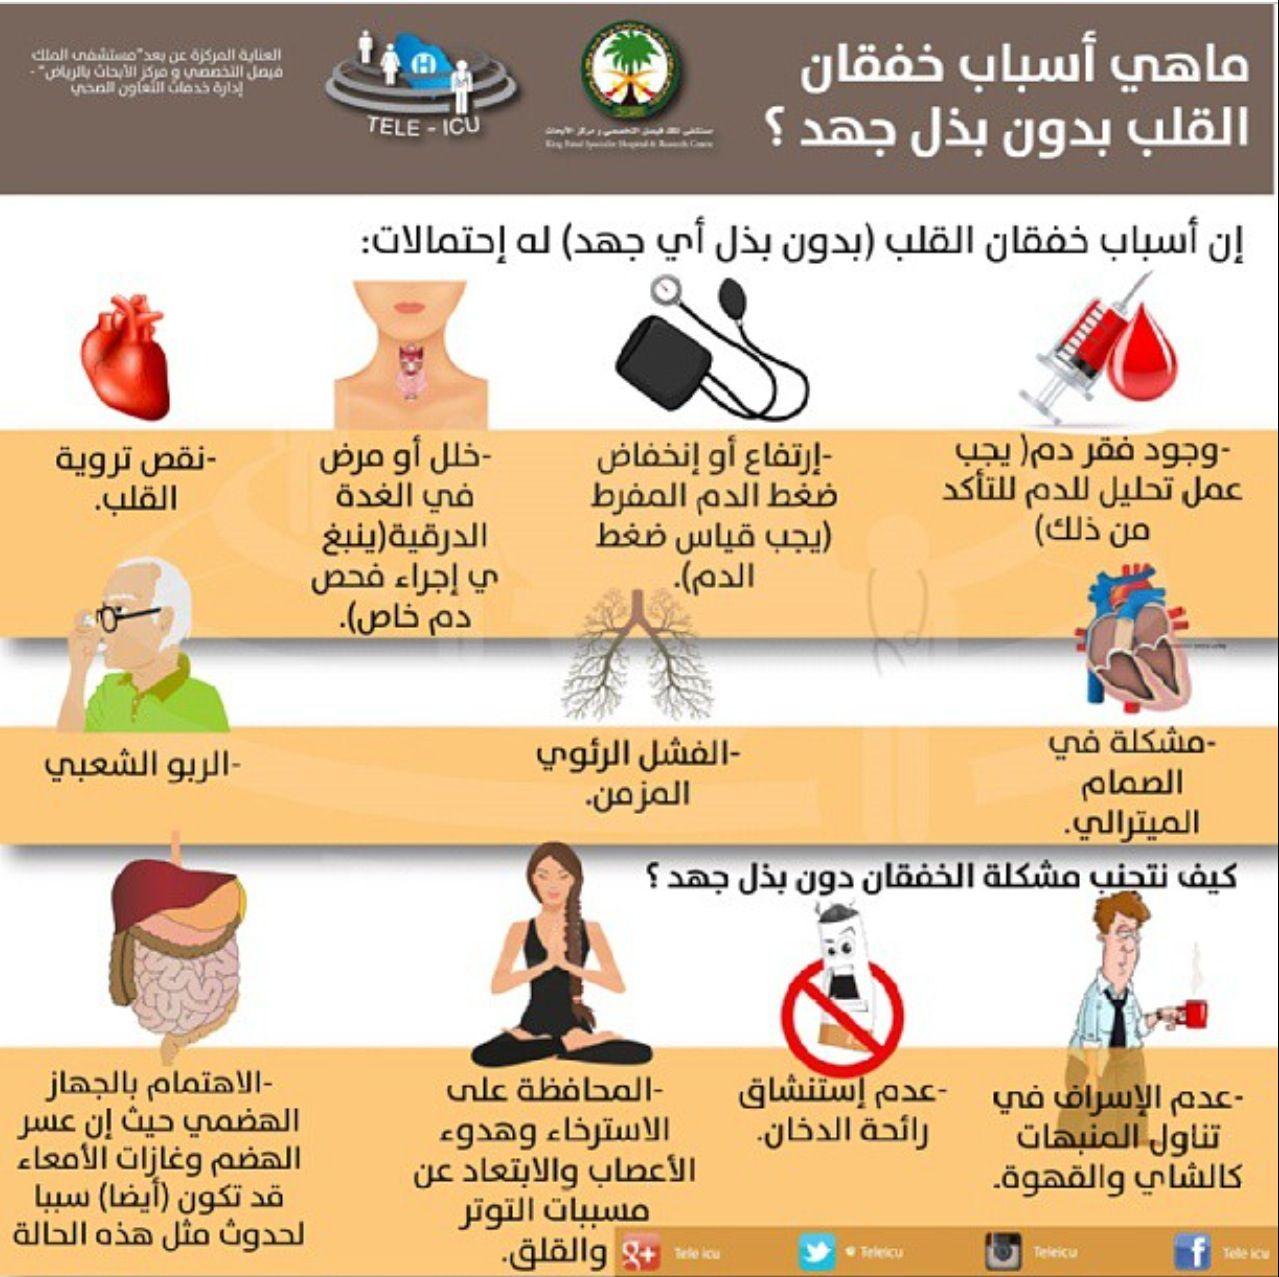 اسباب خفقان القلب بدون بذل اي جهد Health Info Health Fitness Nutrition Medical Information